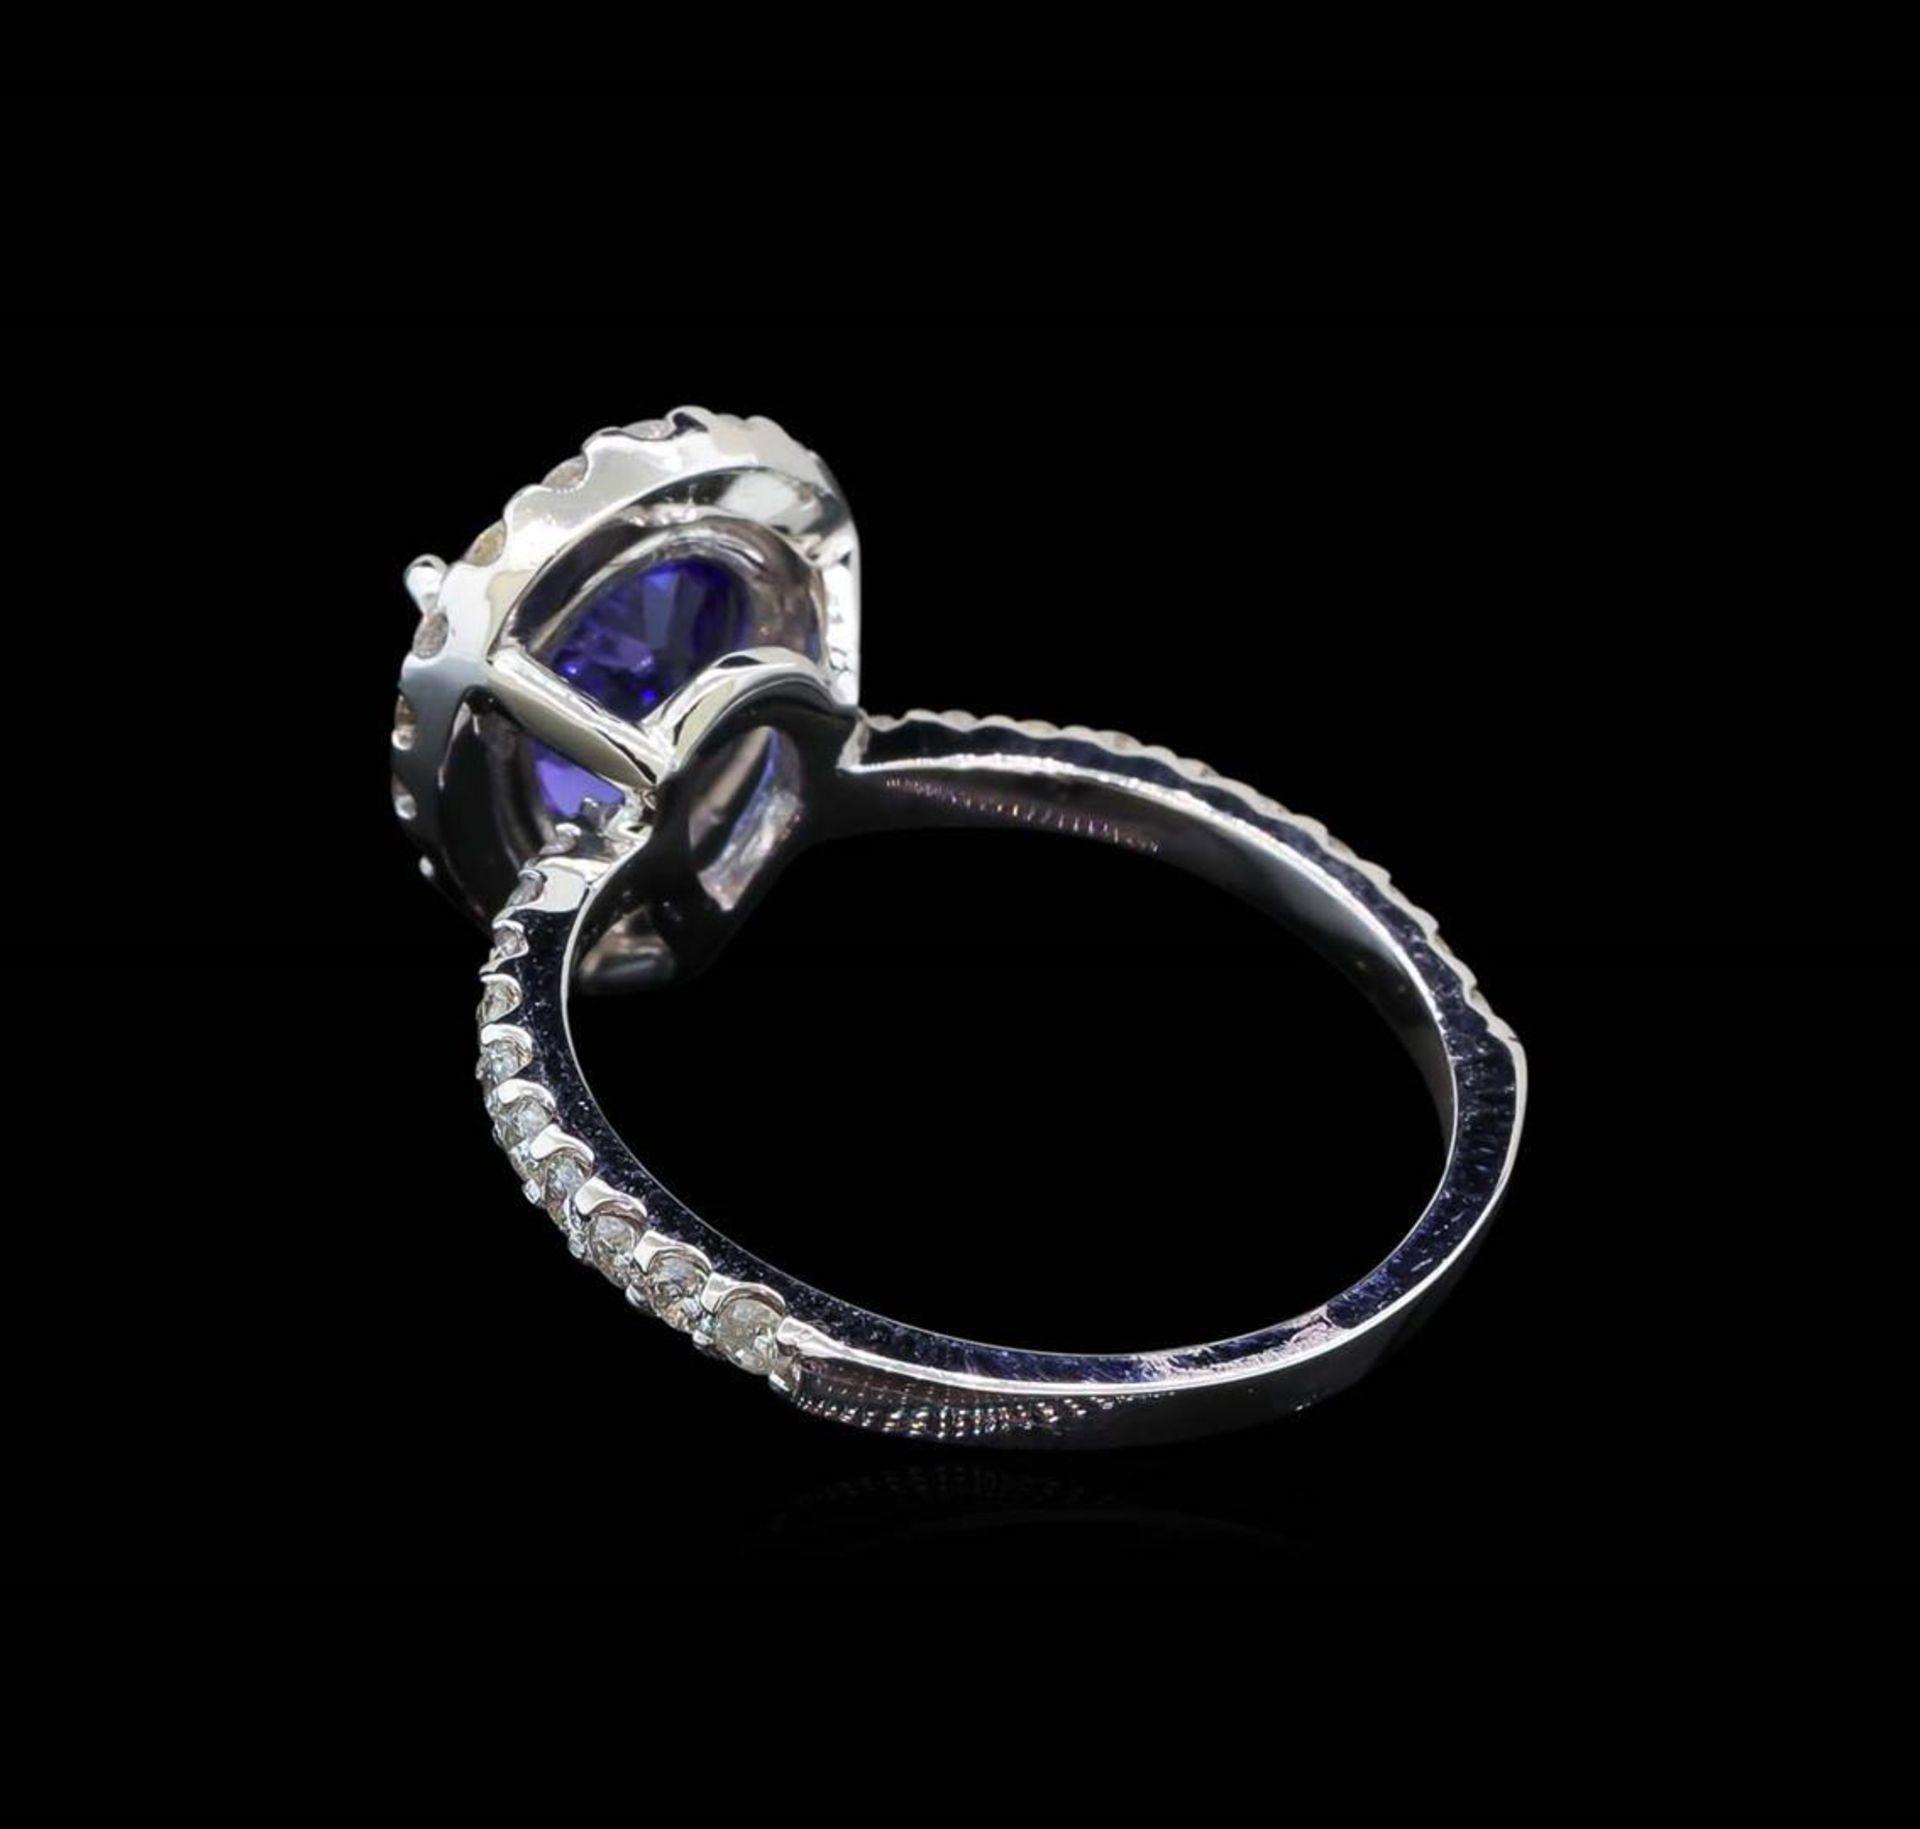 2.20 ctw Tanzanite and Diamond Ring - 14KT White Gold - Image 3 of 5